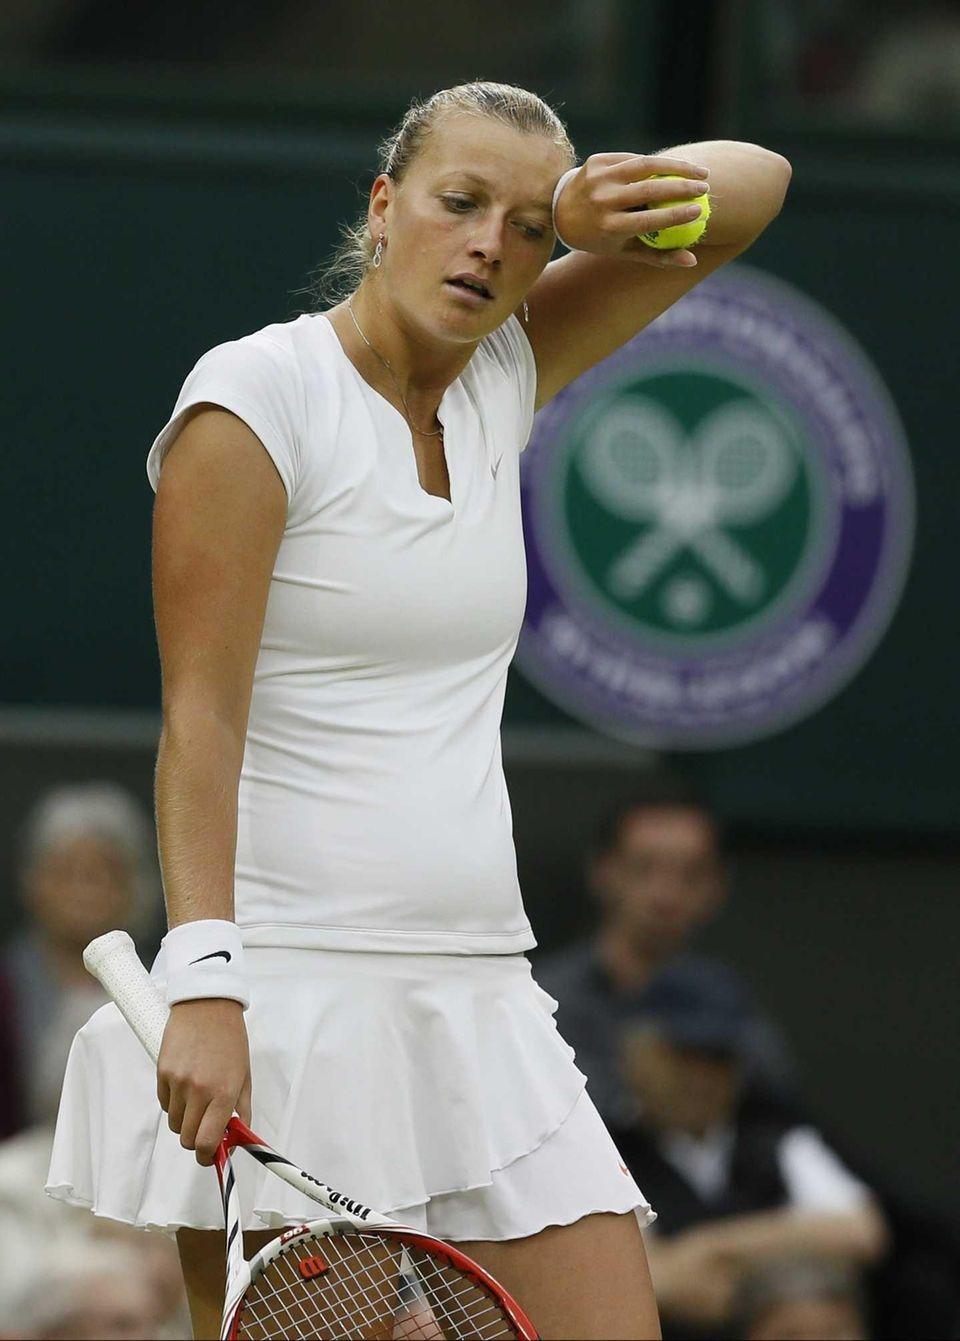 Petra Kvitova of the Czech Republic wipes her